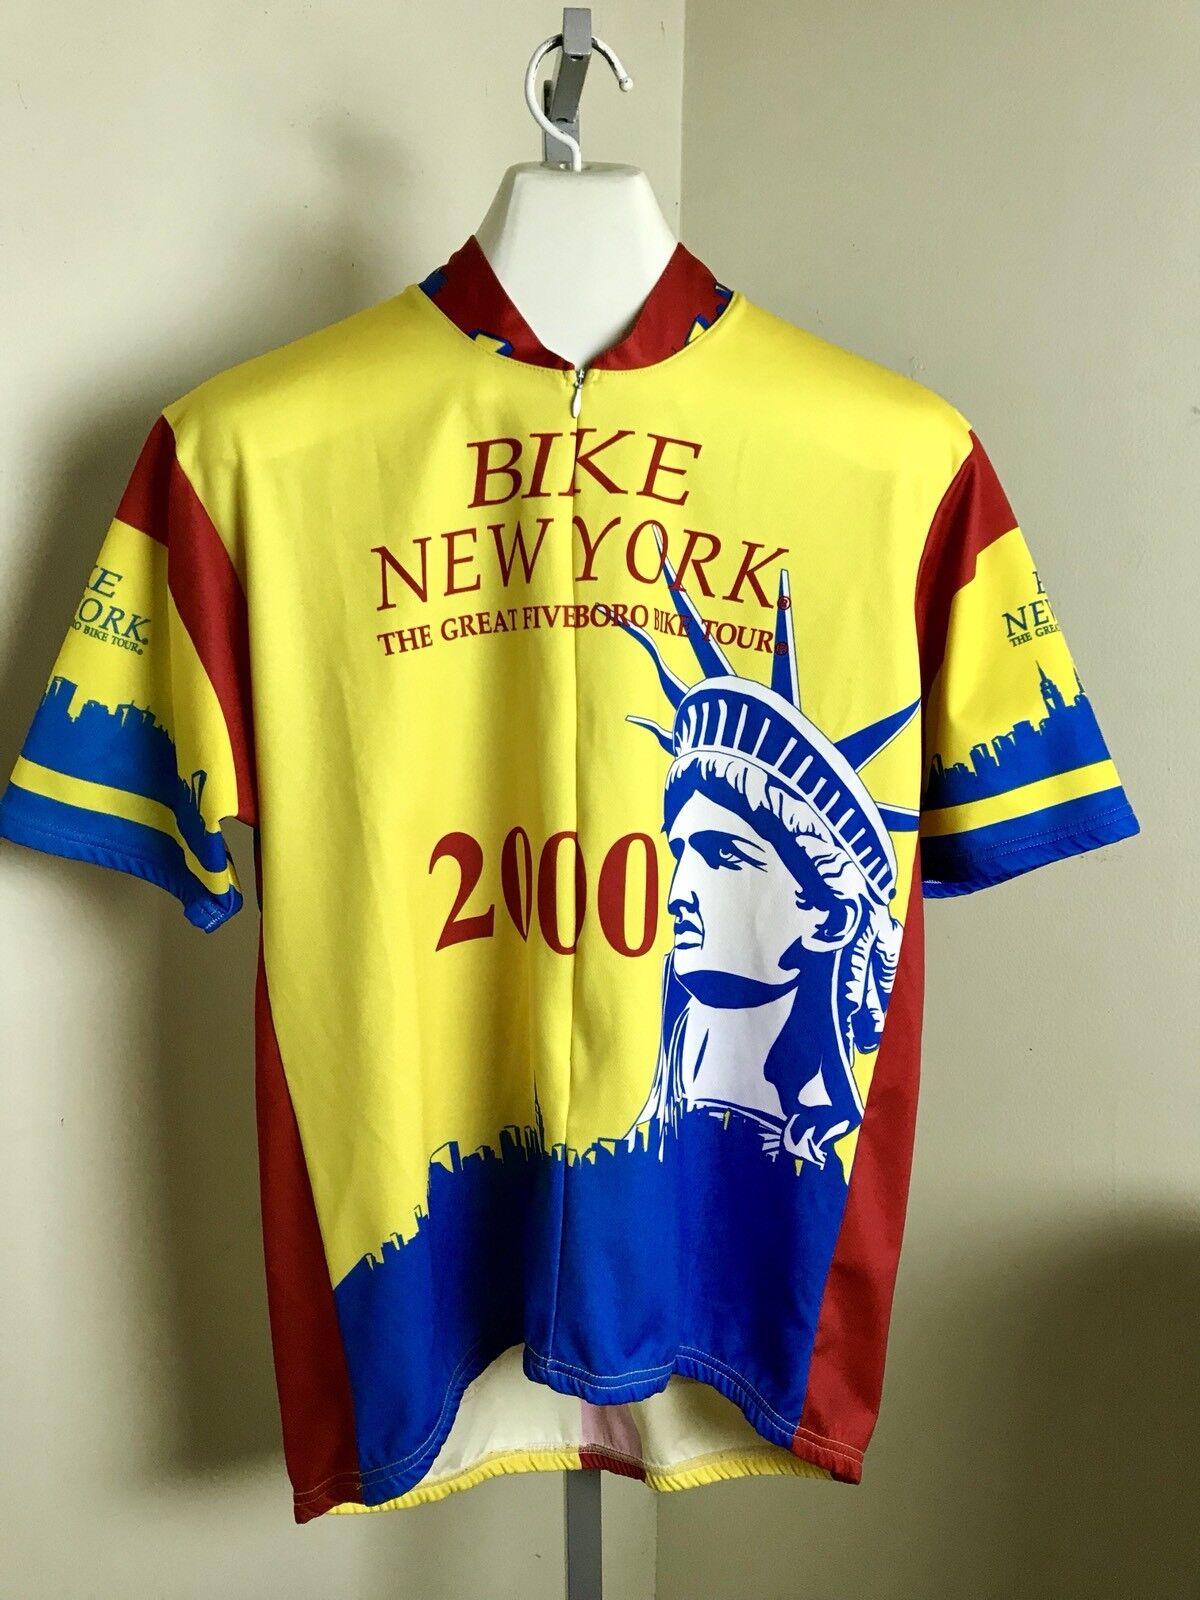 2000 Bike New York Cycling Jersey Shirt Men's 1/4 Zip 2XL Pace Statue Of Liberty